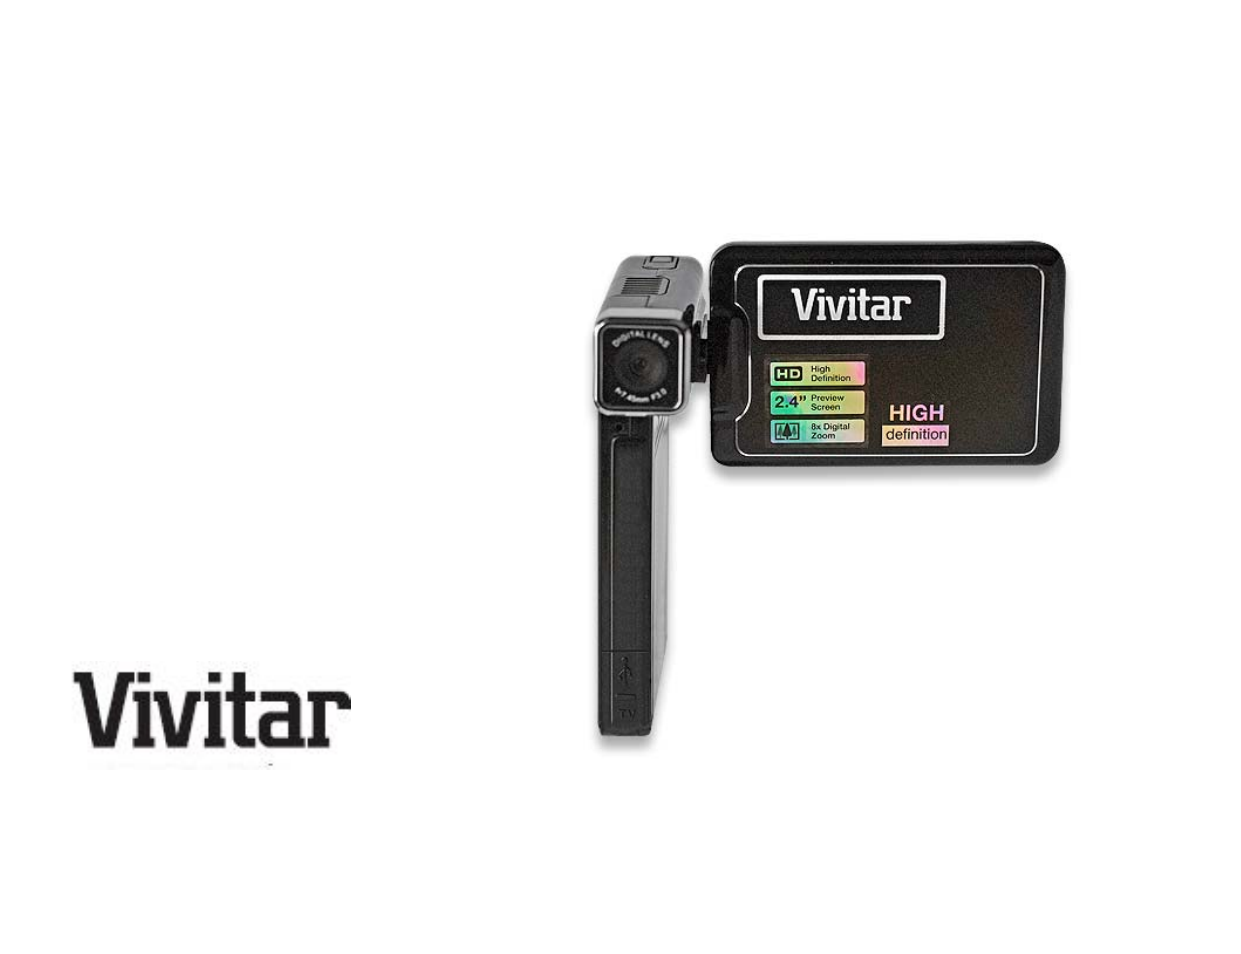 vivitar dvr 865hd user manual 69 pages rh manualsdir com